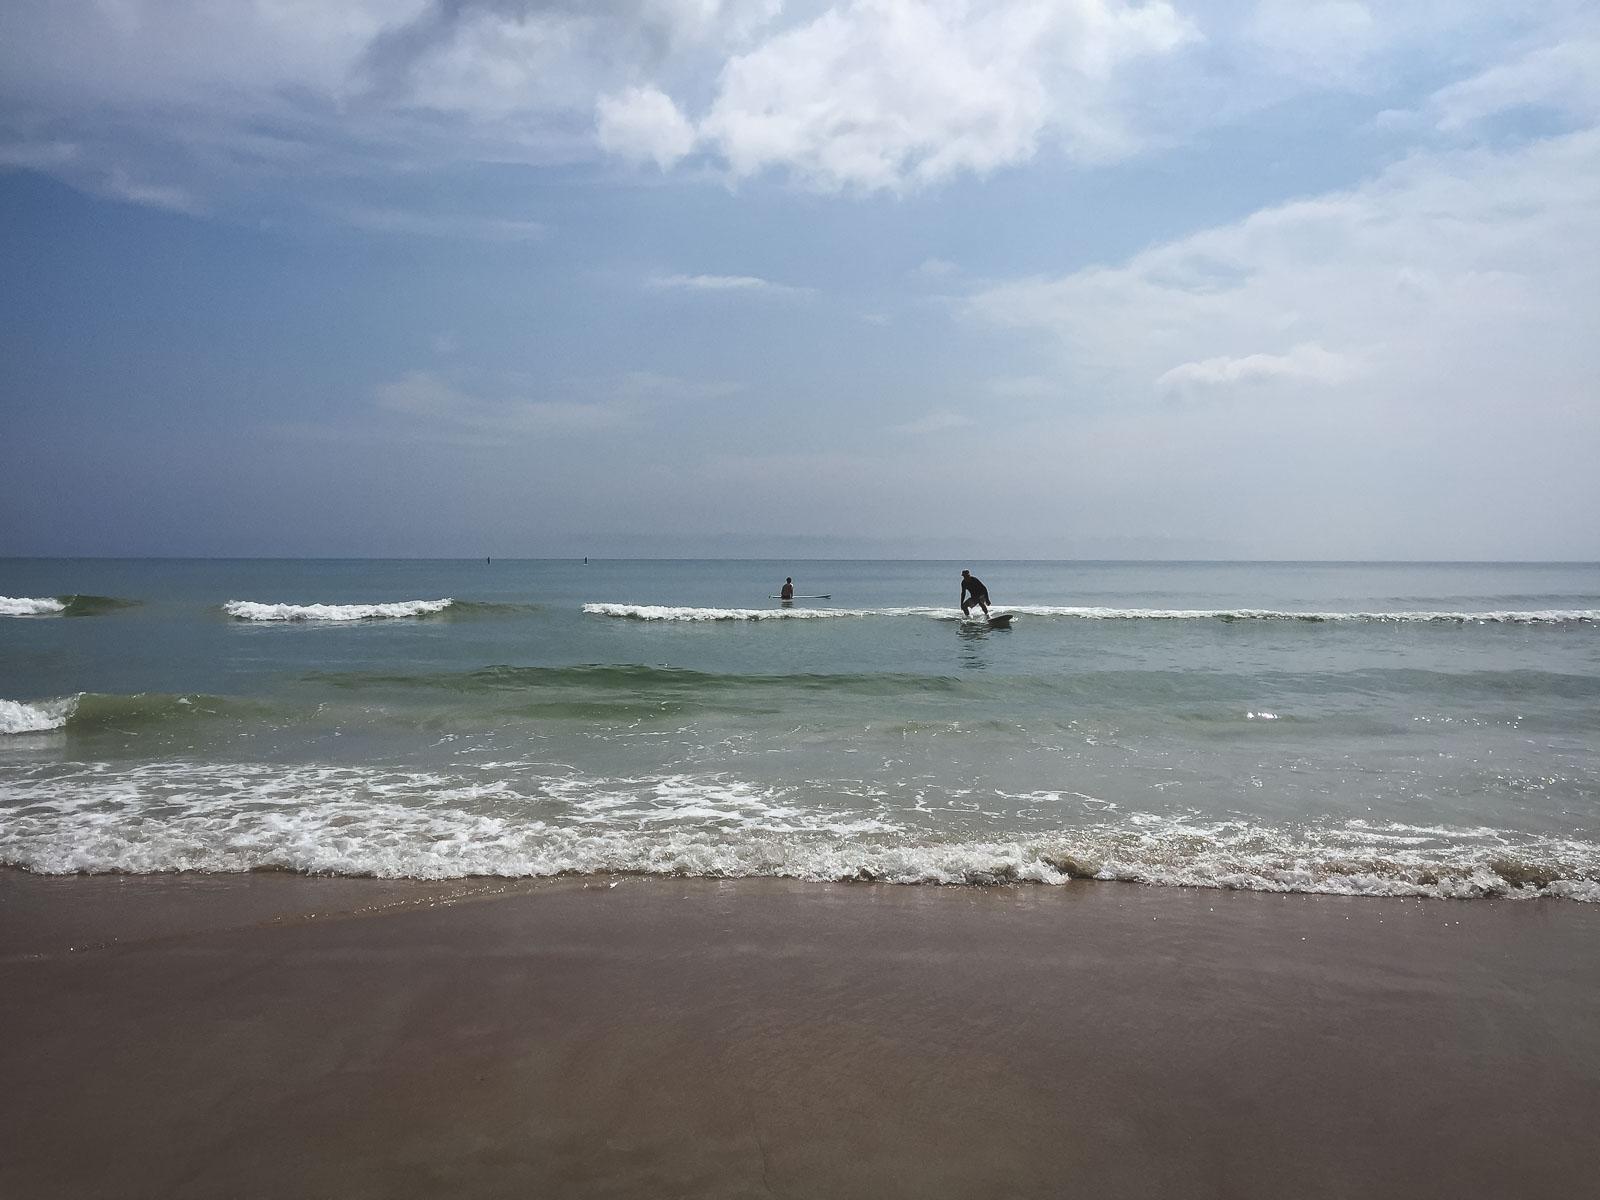 surfing the waves at Daytona Beach